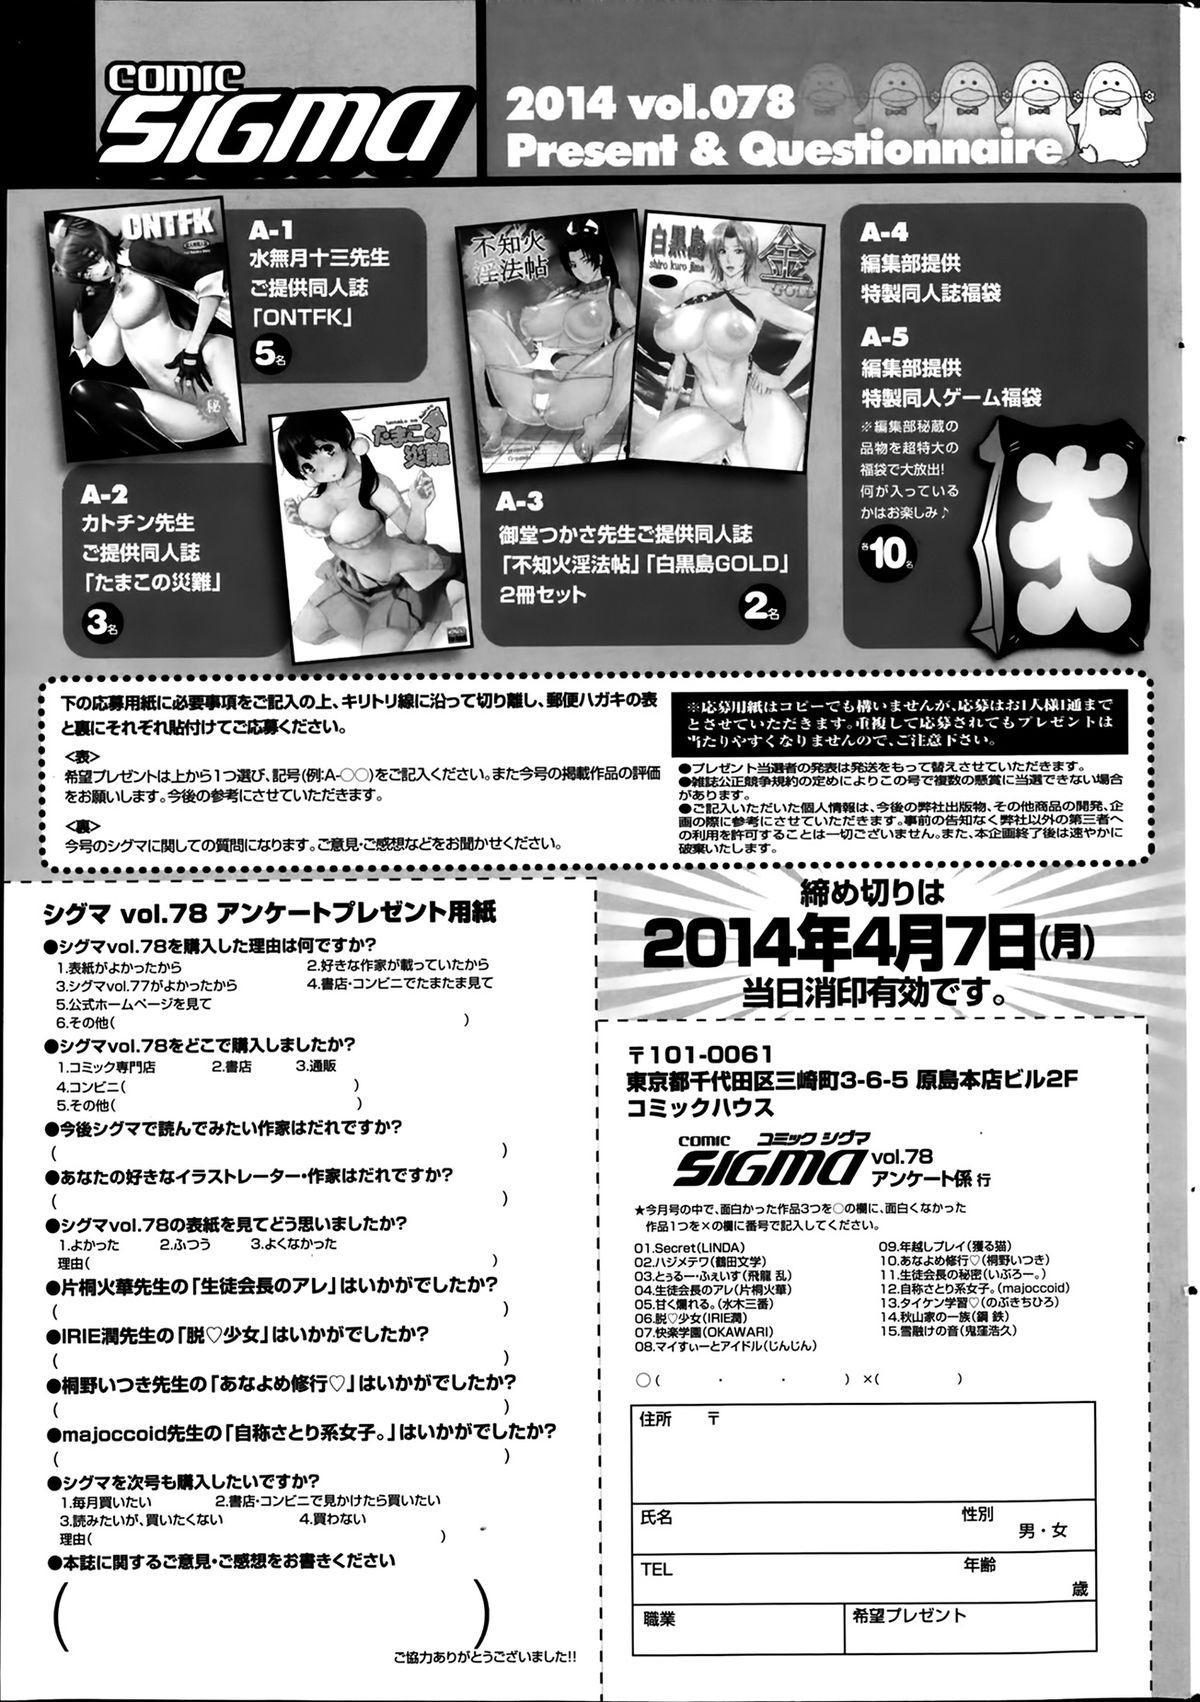 COMIC SIGMA 2014-03 Vol.78 267